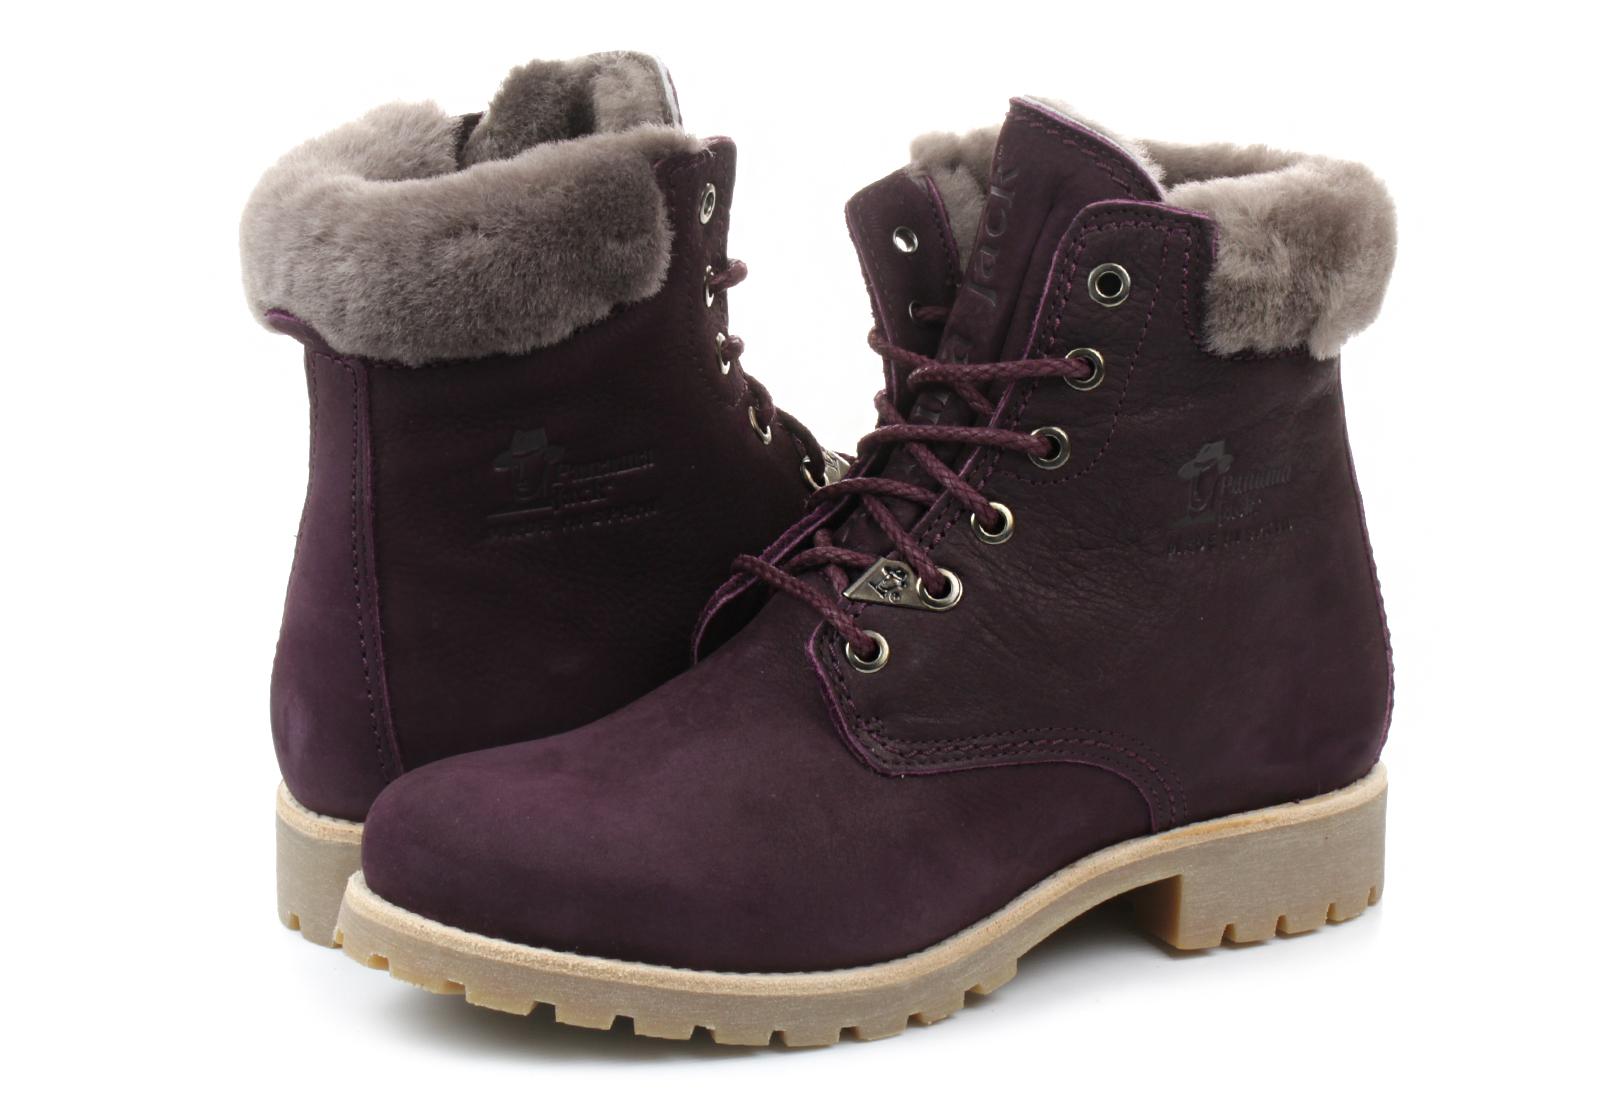 Panama Jack Boots - Panama 03 Igloo - Panama-IG-B25 - Online ... ae0bd767745